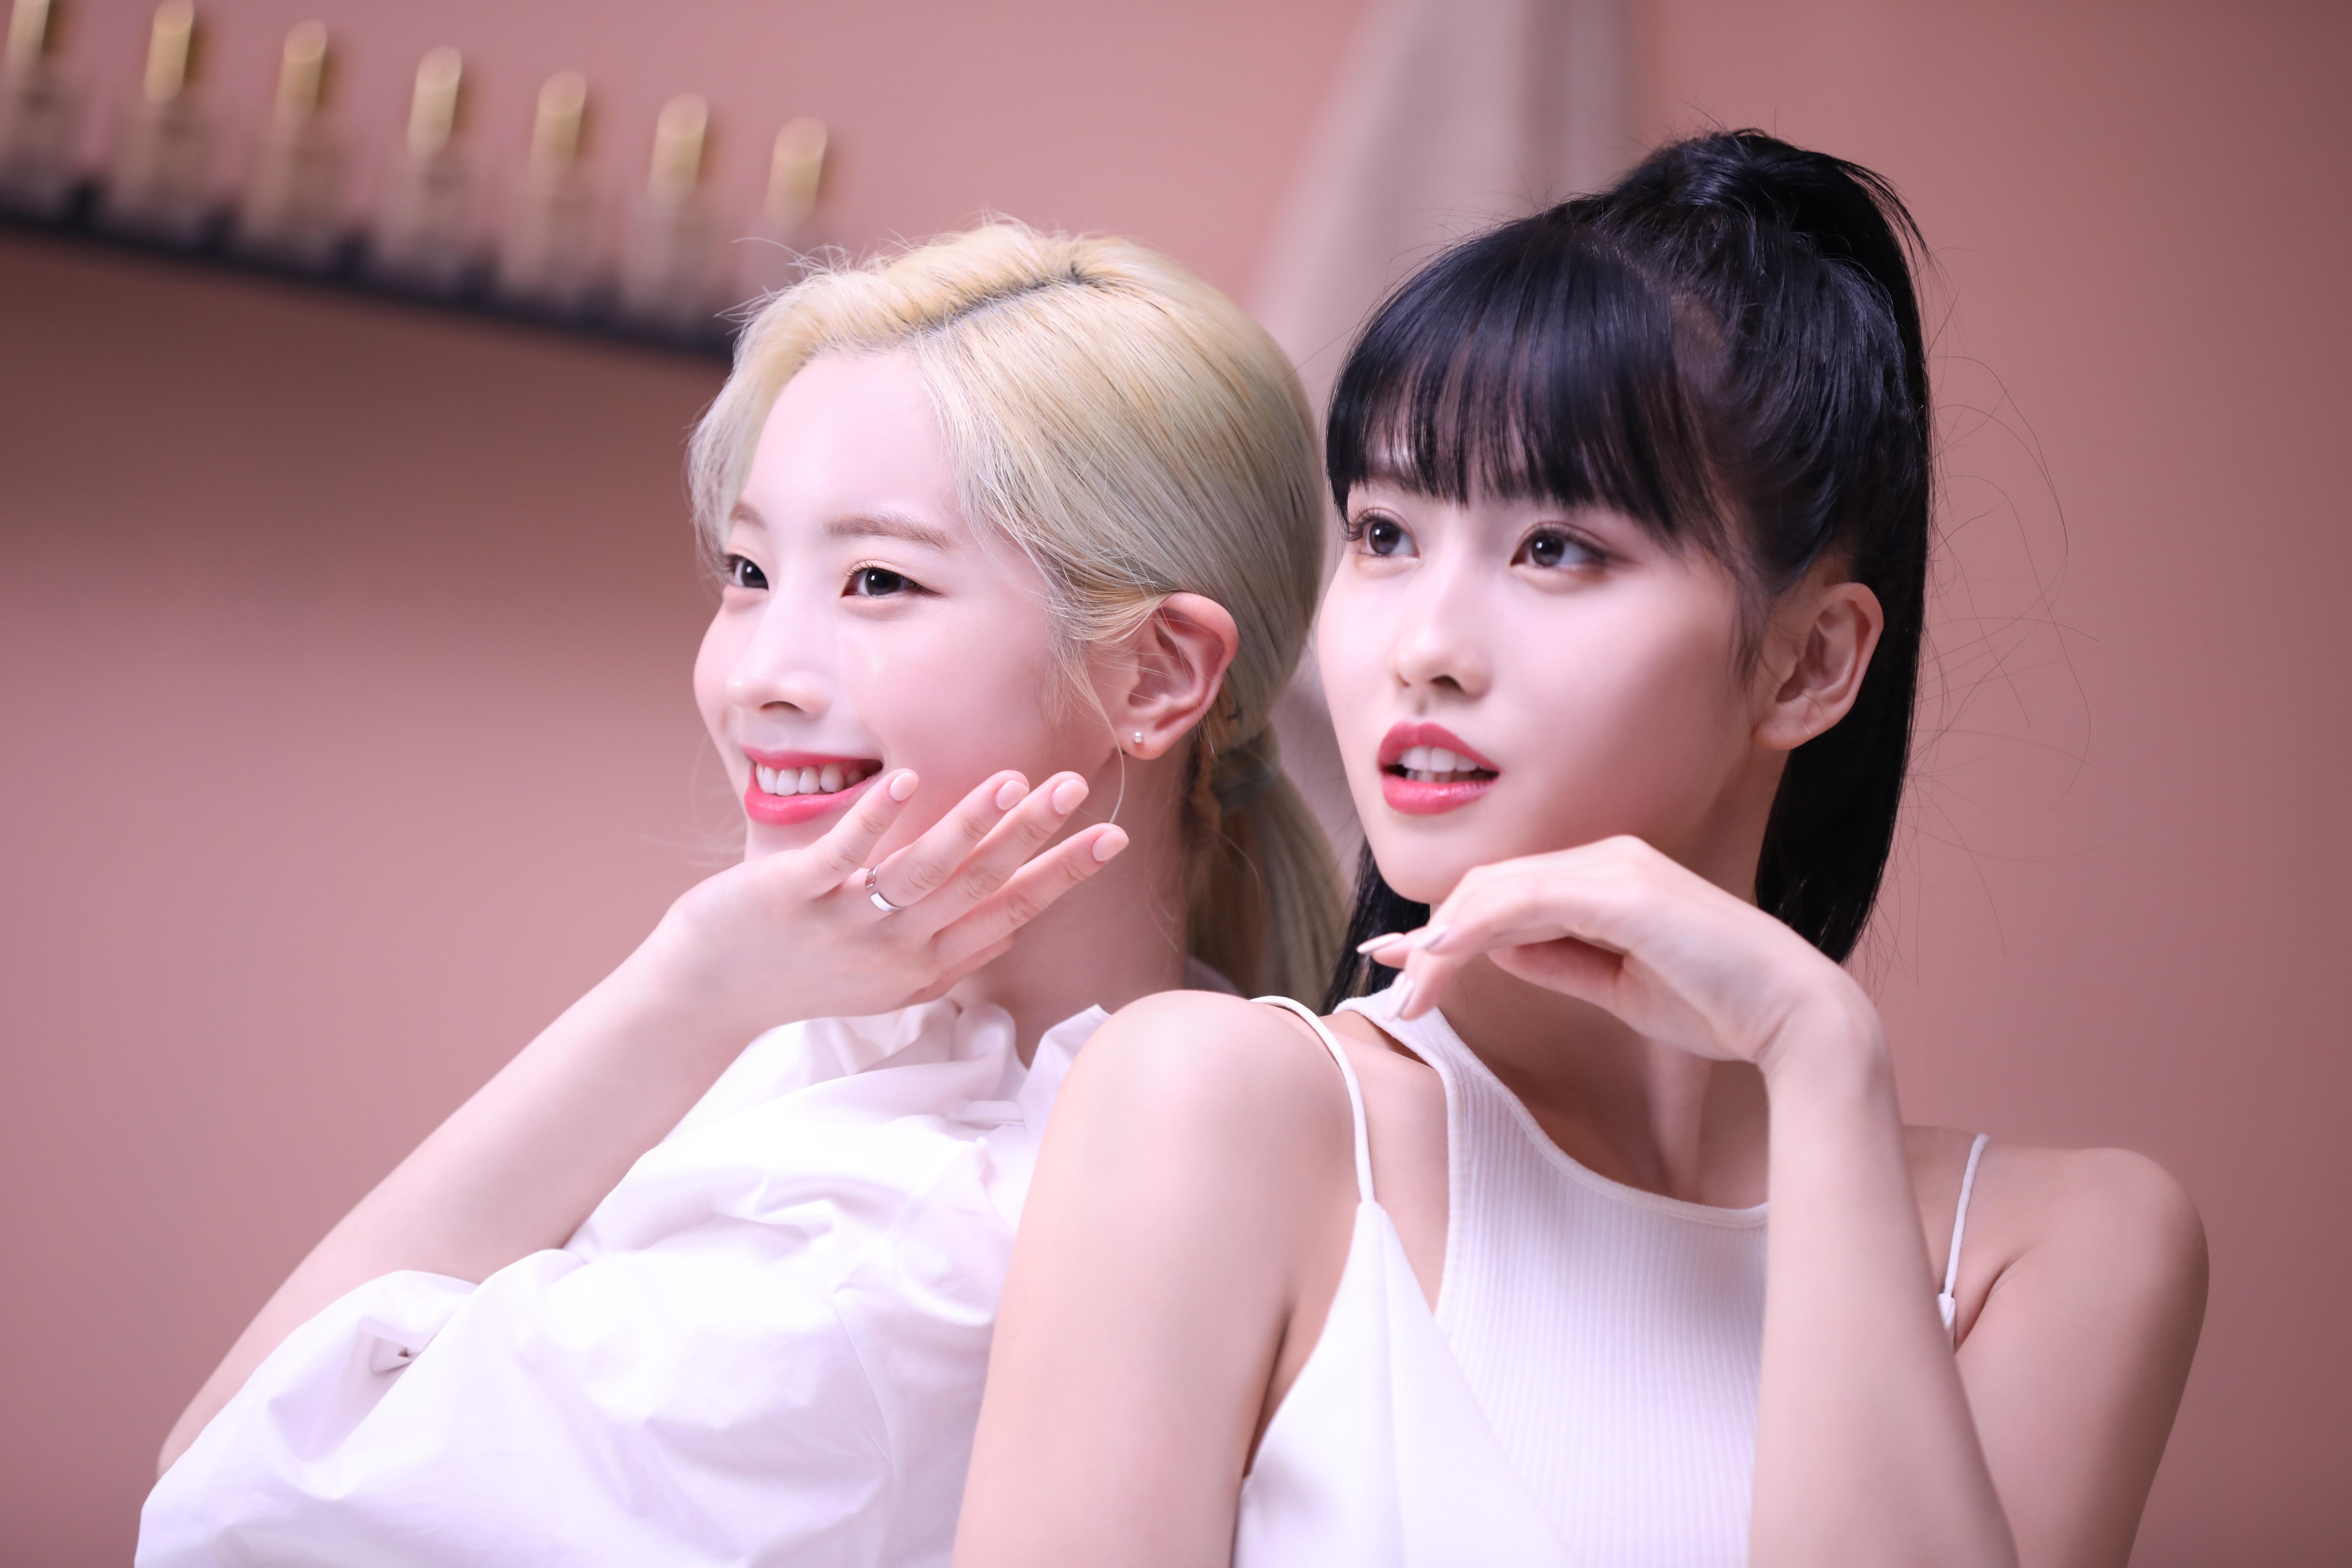 People 6720x4480 Twice twice momo twice dahyun K-pop Asian korean women women people